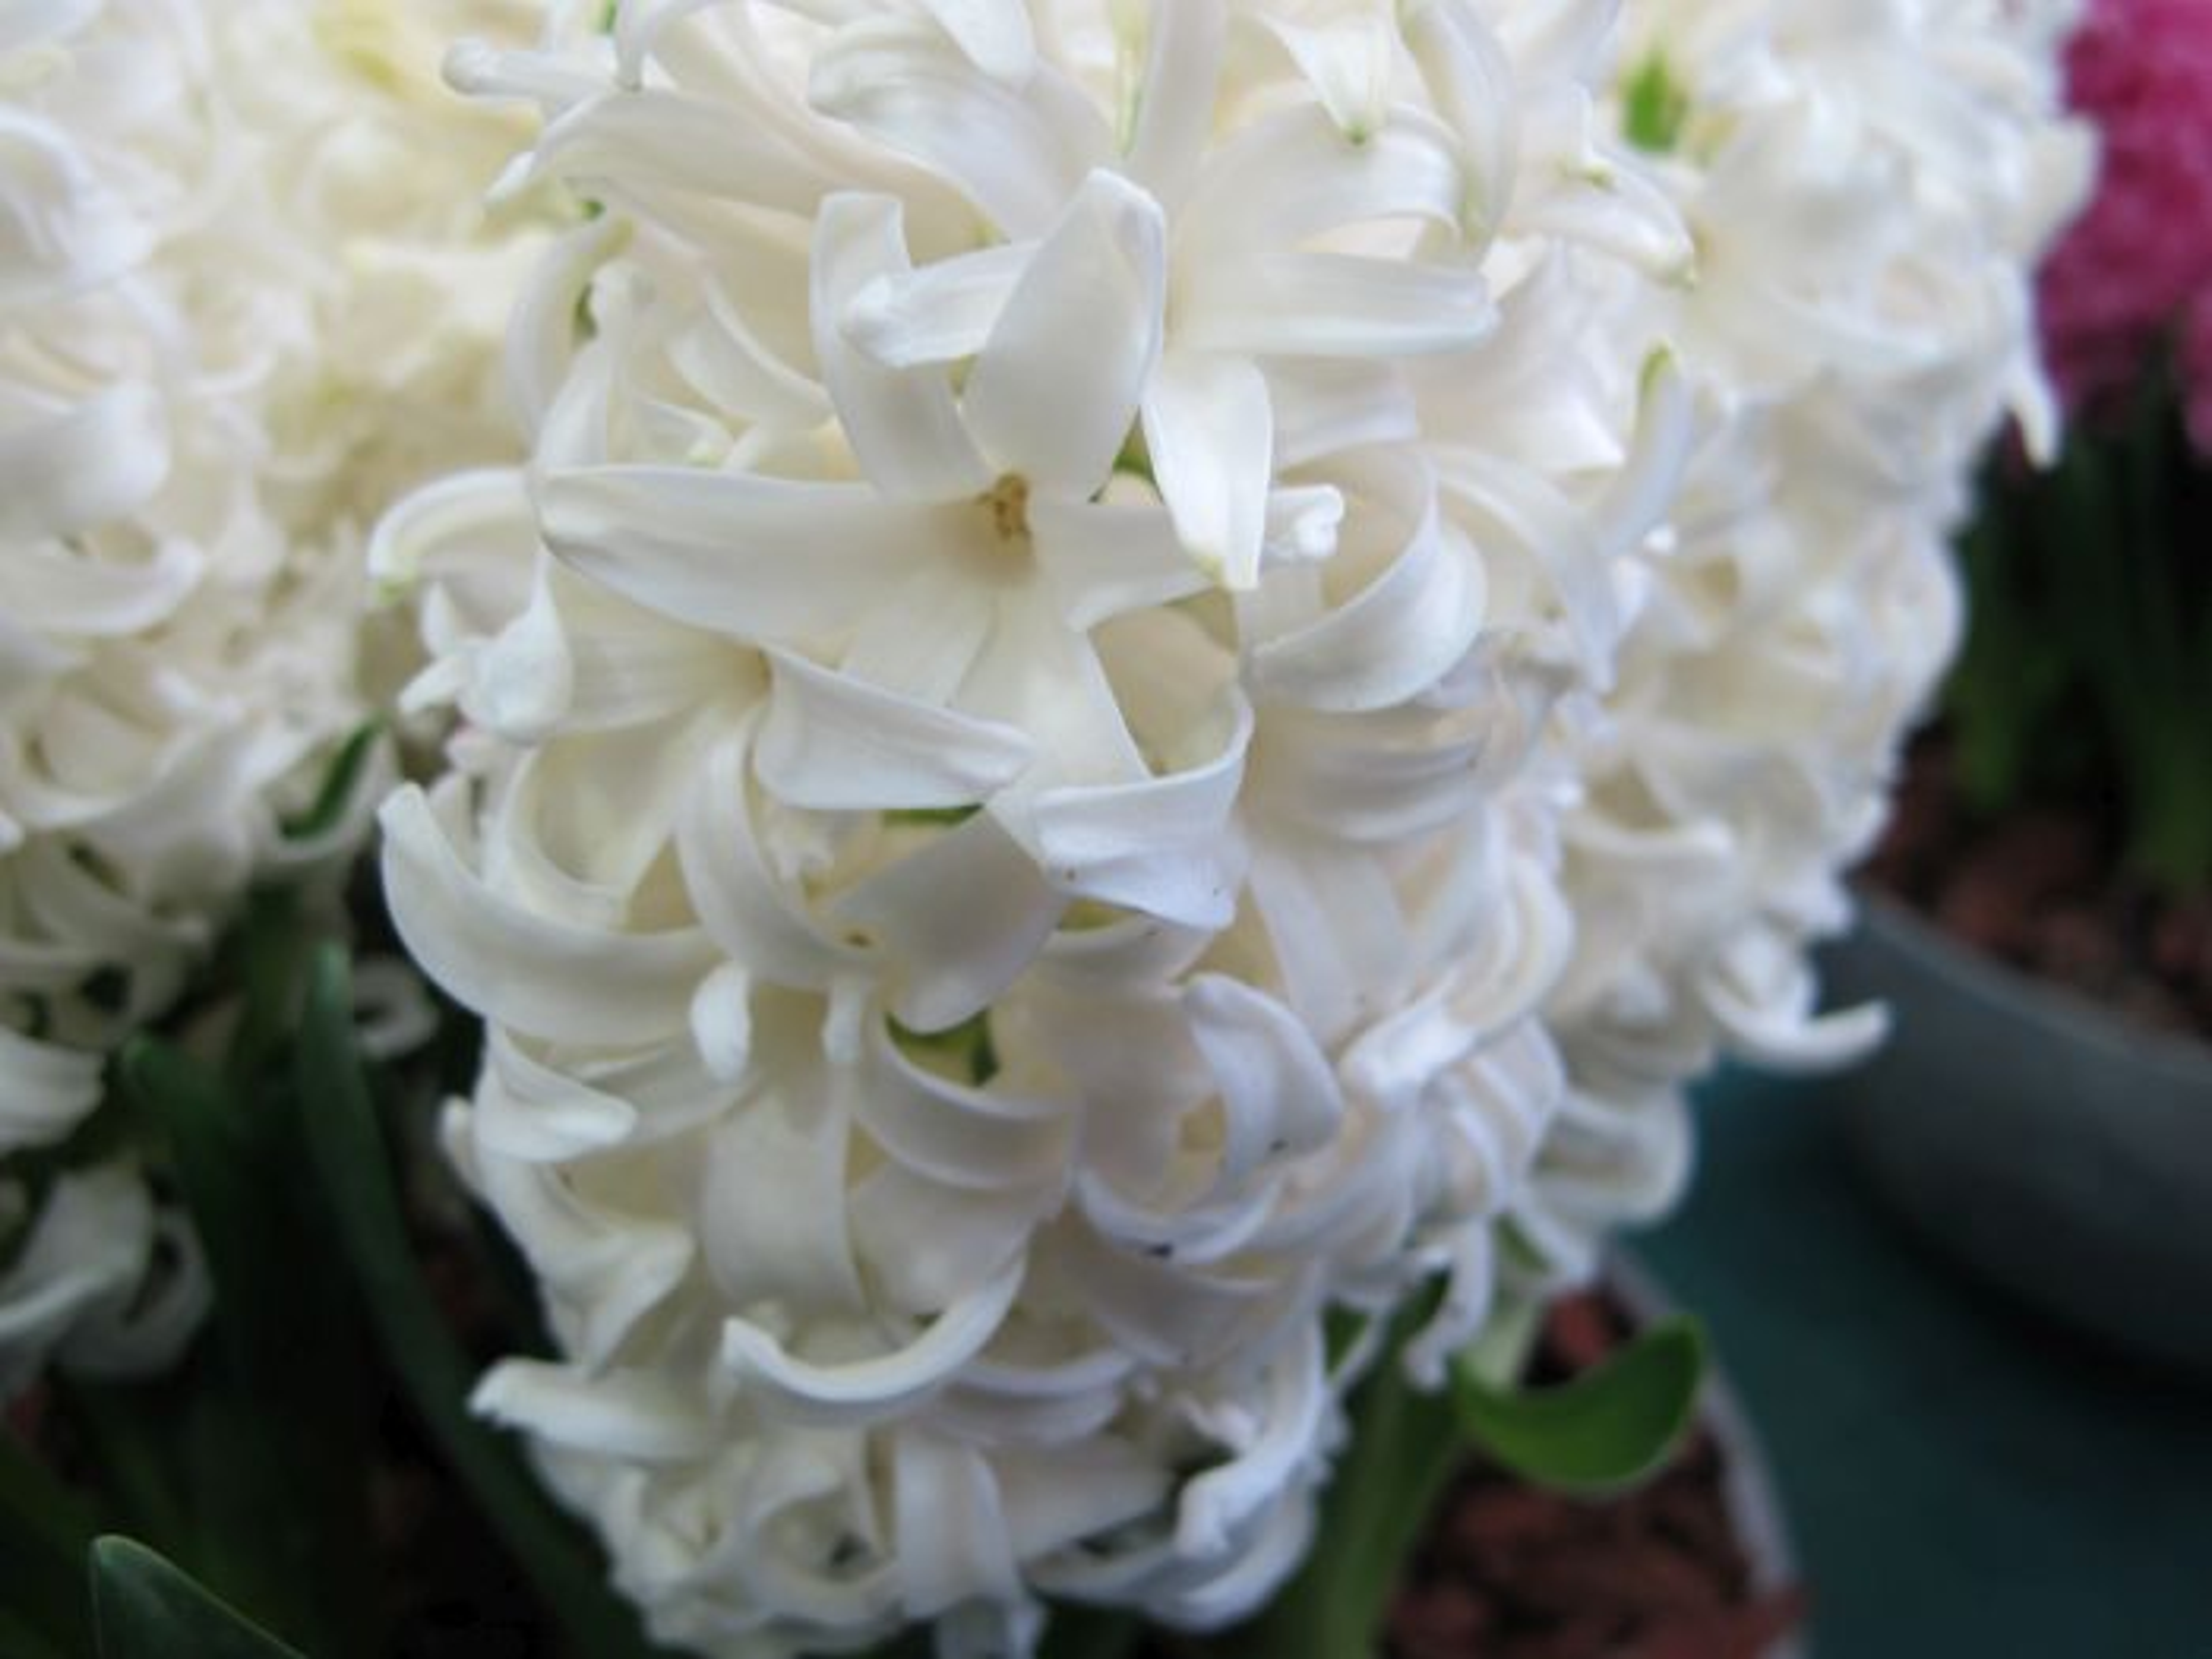 hyacinth 'White Pearl'